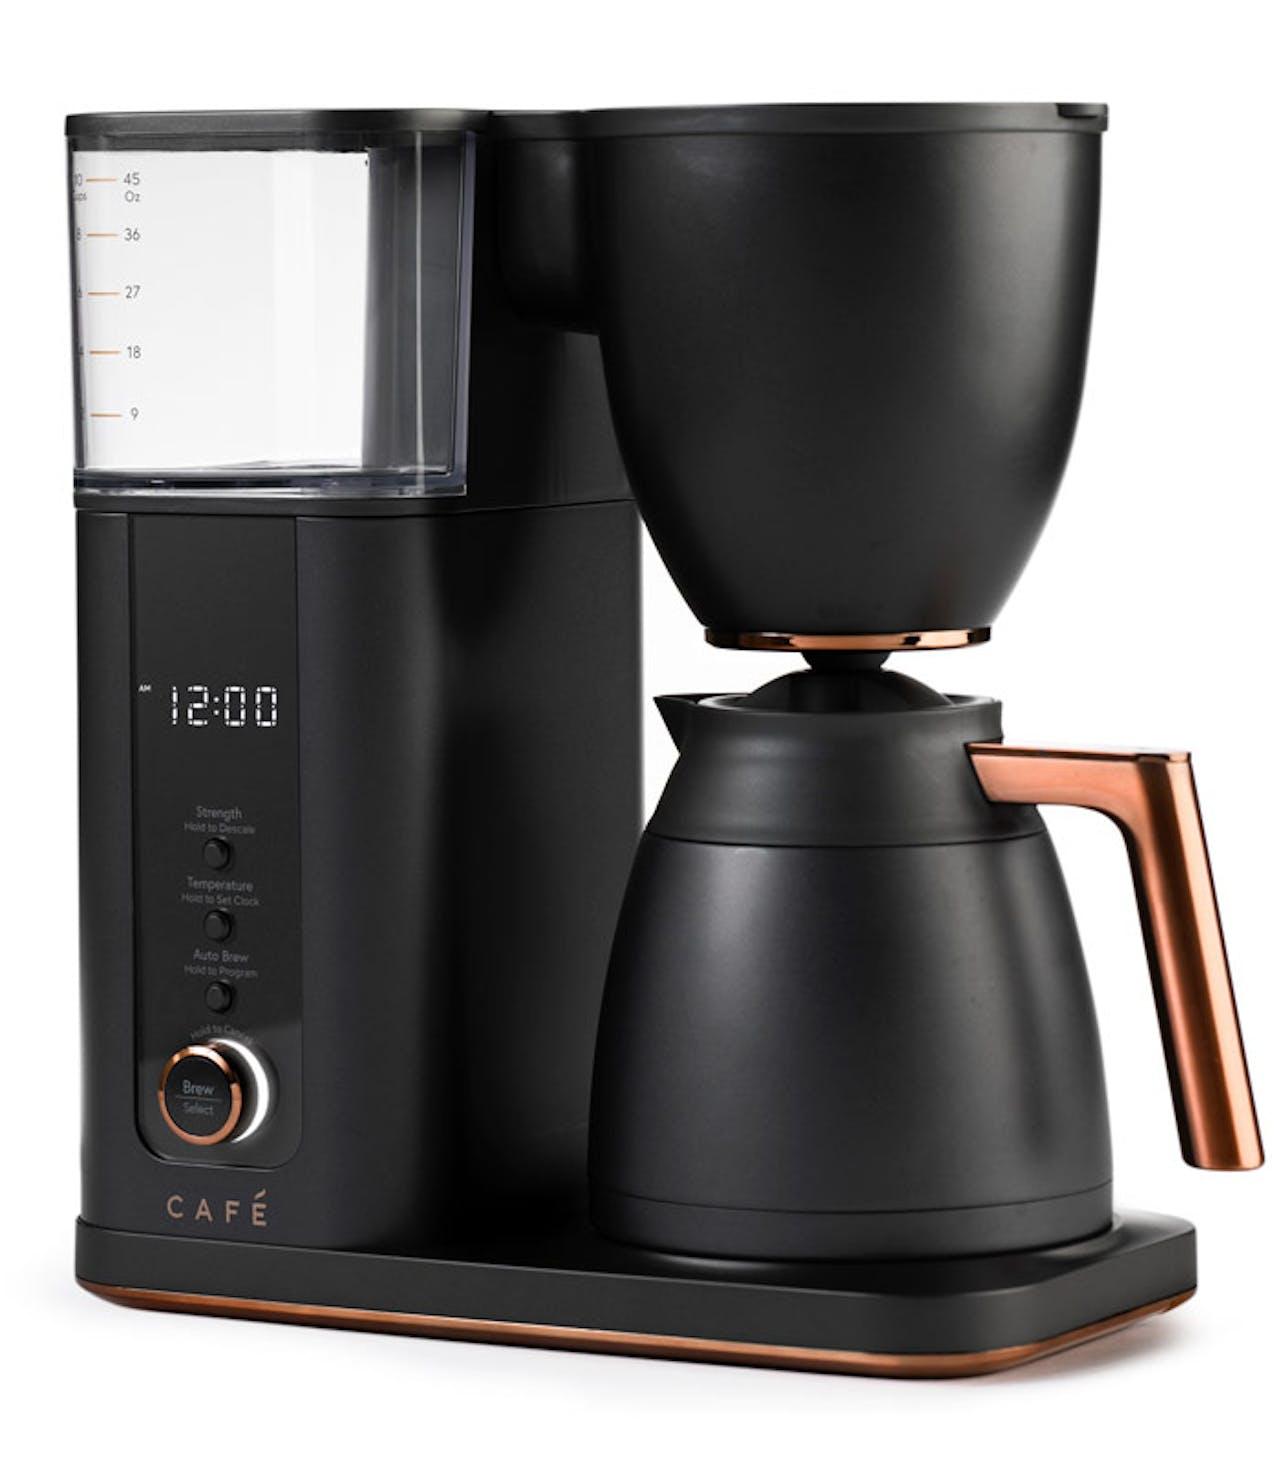 café specialty drip coffee maker in matte black